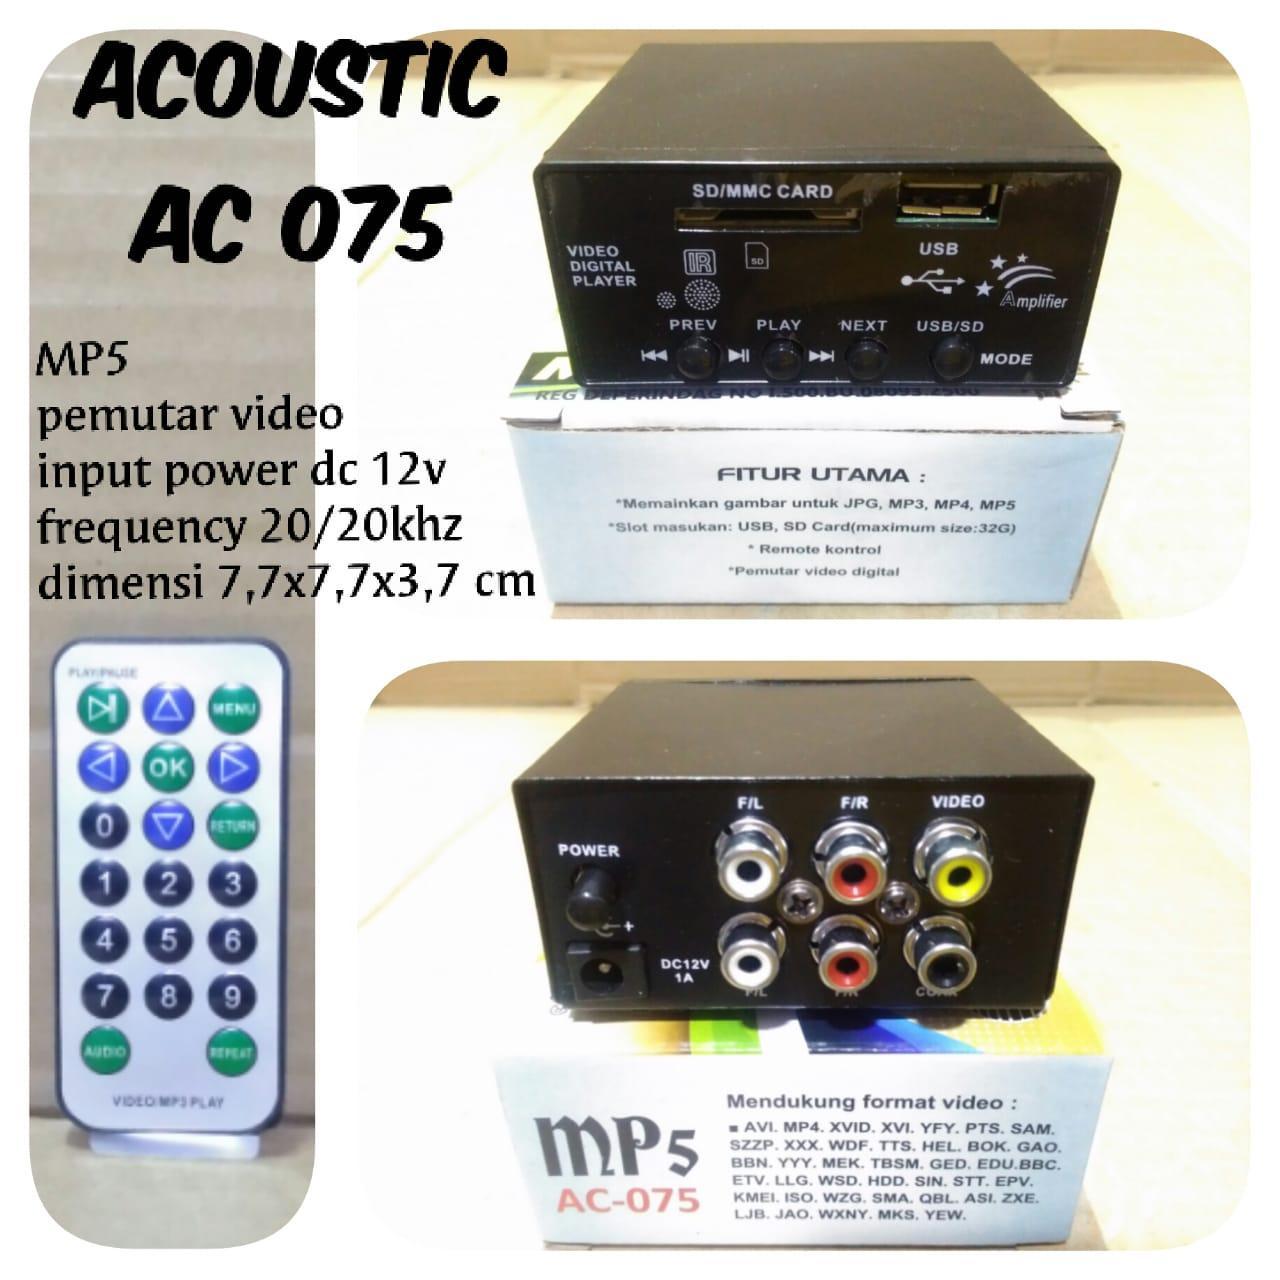 alat pemutar PLAYER MP4 MP5 MP3 USB VIDEO film ac dc LTHS